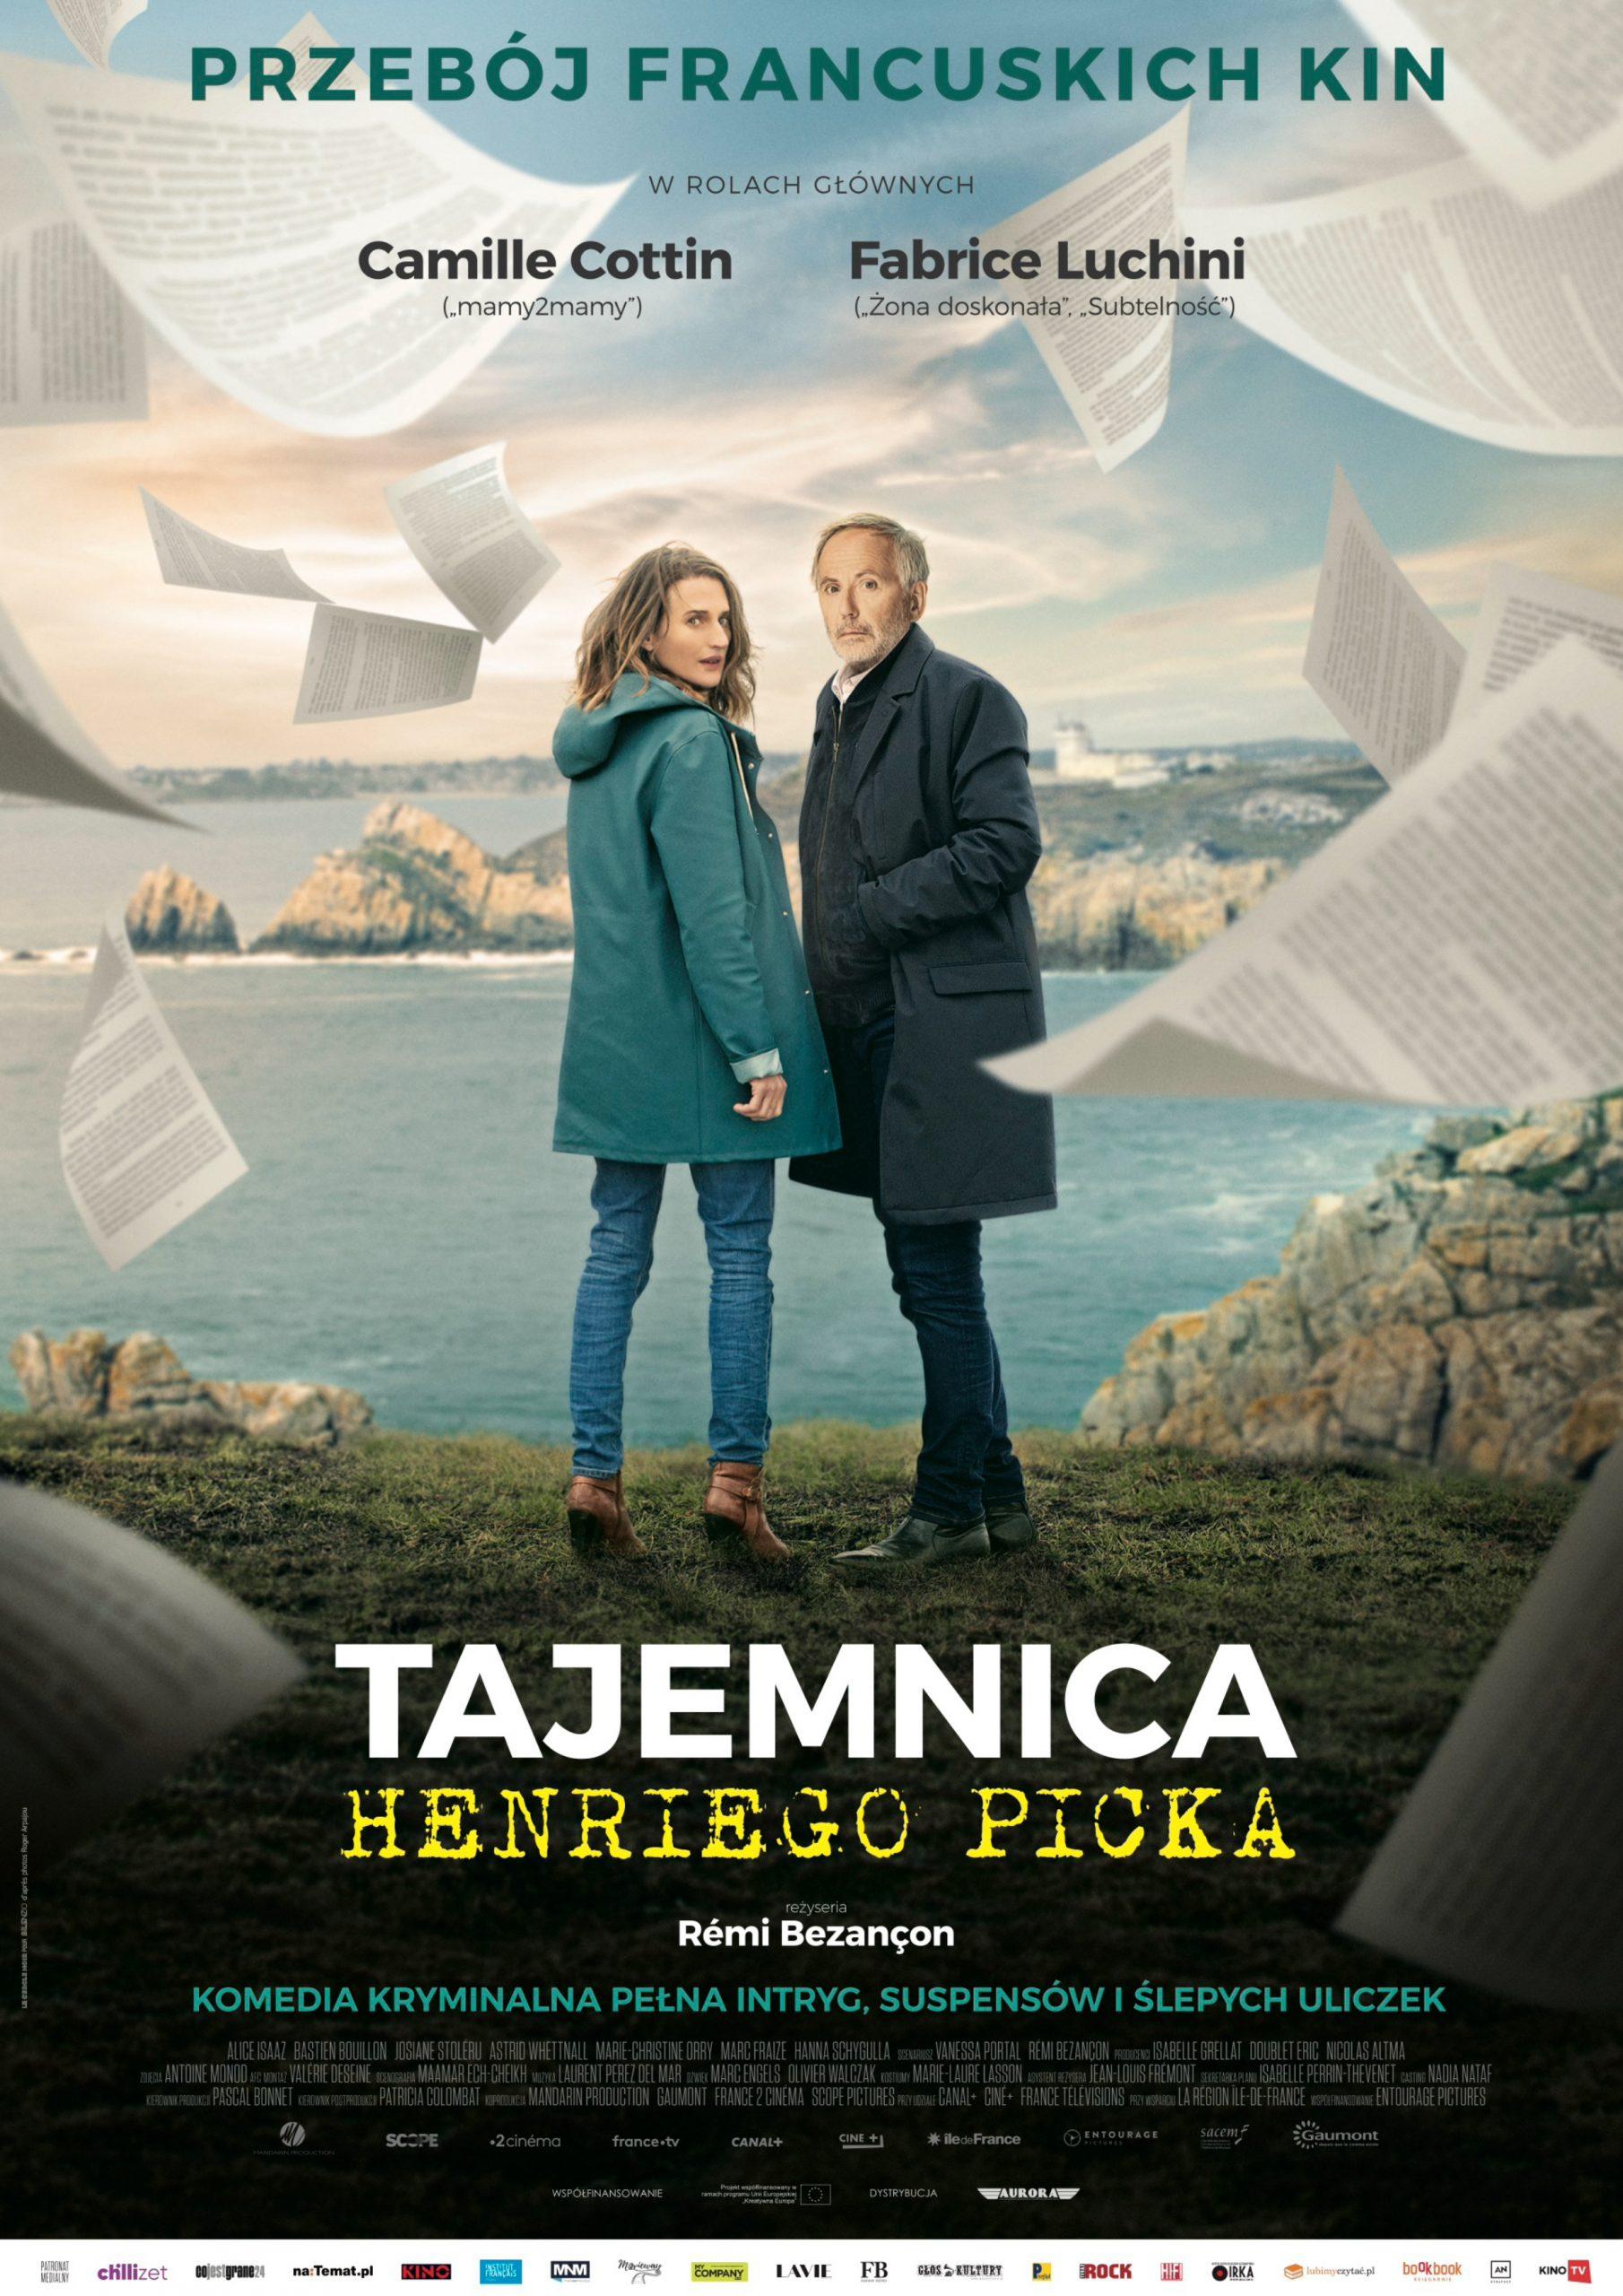 plakat_tajemnica-henriego-picka_b1hbd